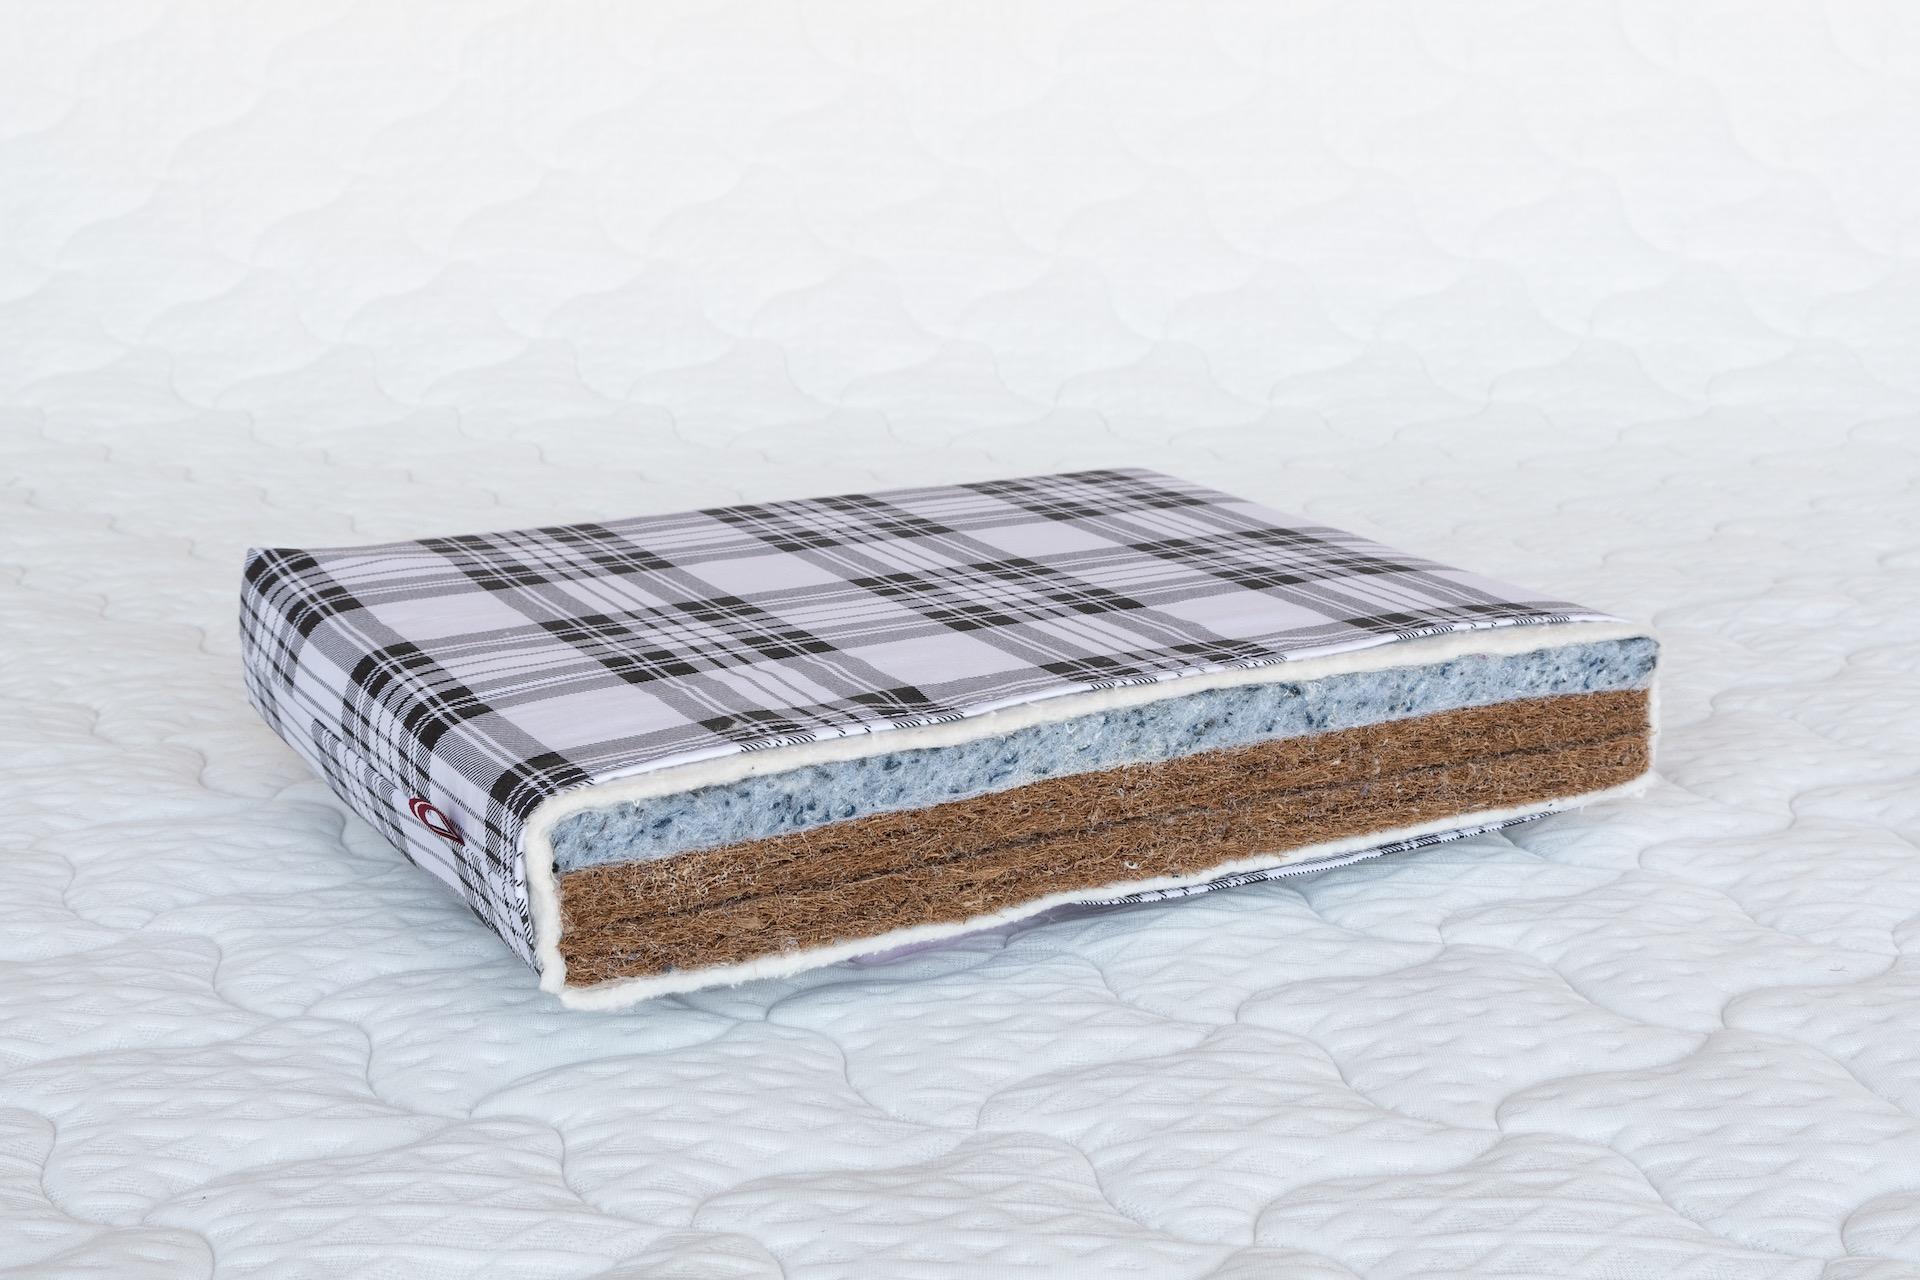 relat.lv-matracis-Bērnu matracis KokossStrutofaibers 6 cm